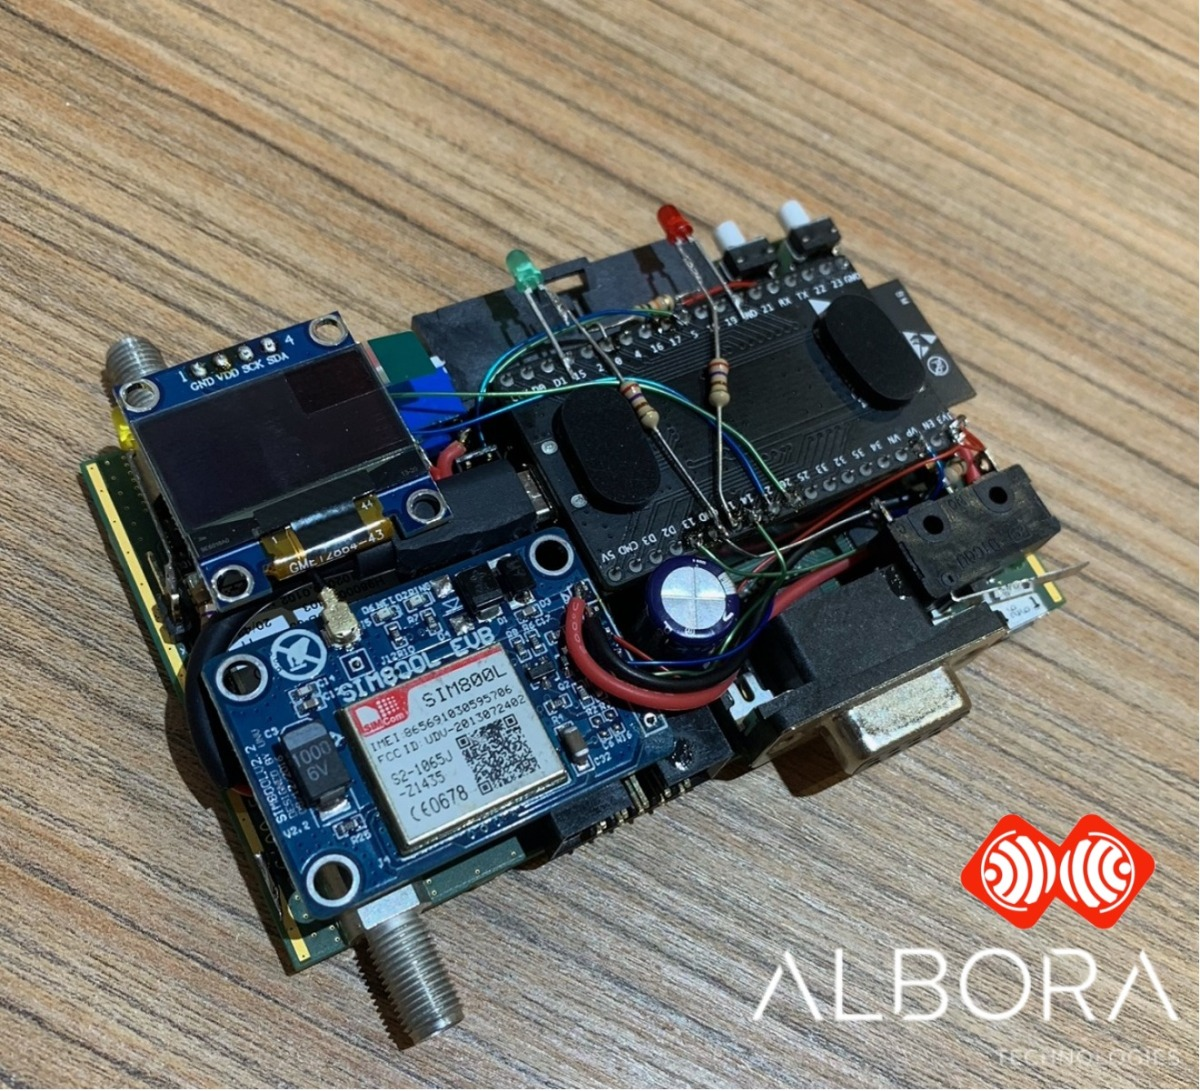 FULL Size -  AGROTRONIC ESPrtk MQTT NTRIP Radio LoRa Bluetooth F9P M8P F9P Ublox Navspark Ethernet ENC28J60 WW5500 MPU9250 IMU SD Card SARA 2G 3G 4G Cellular